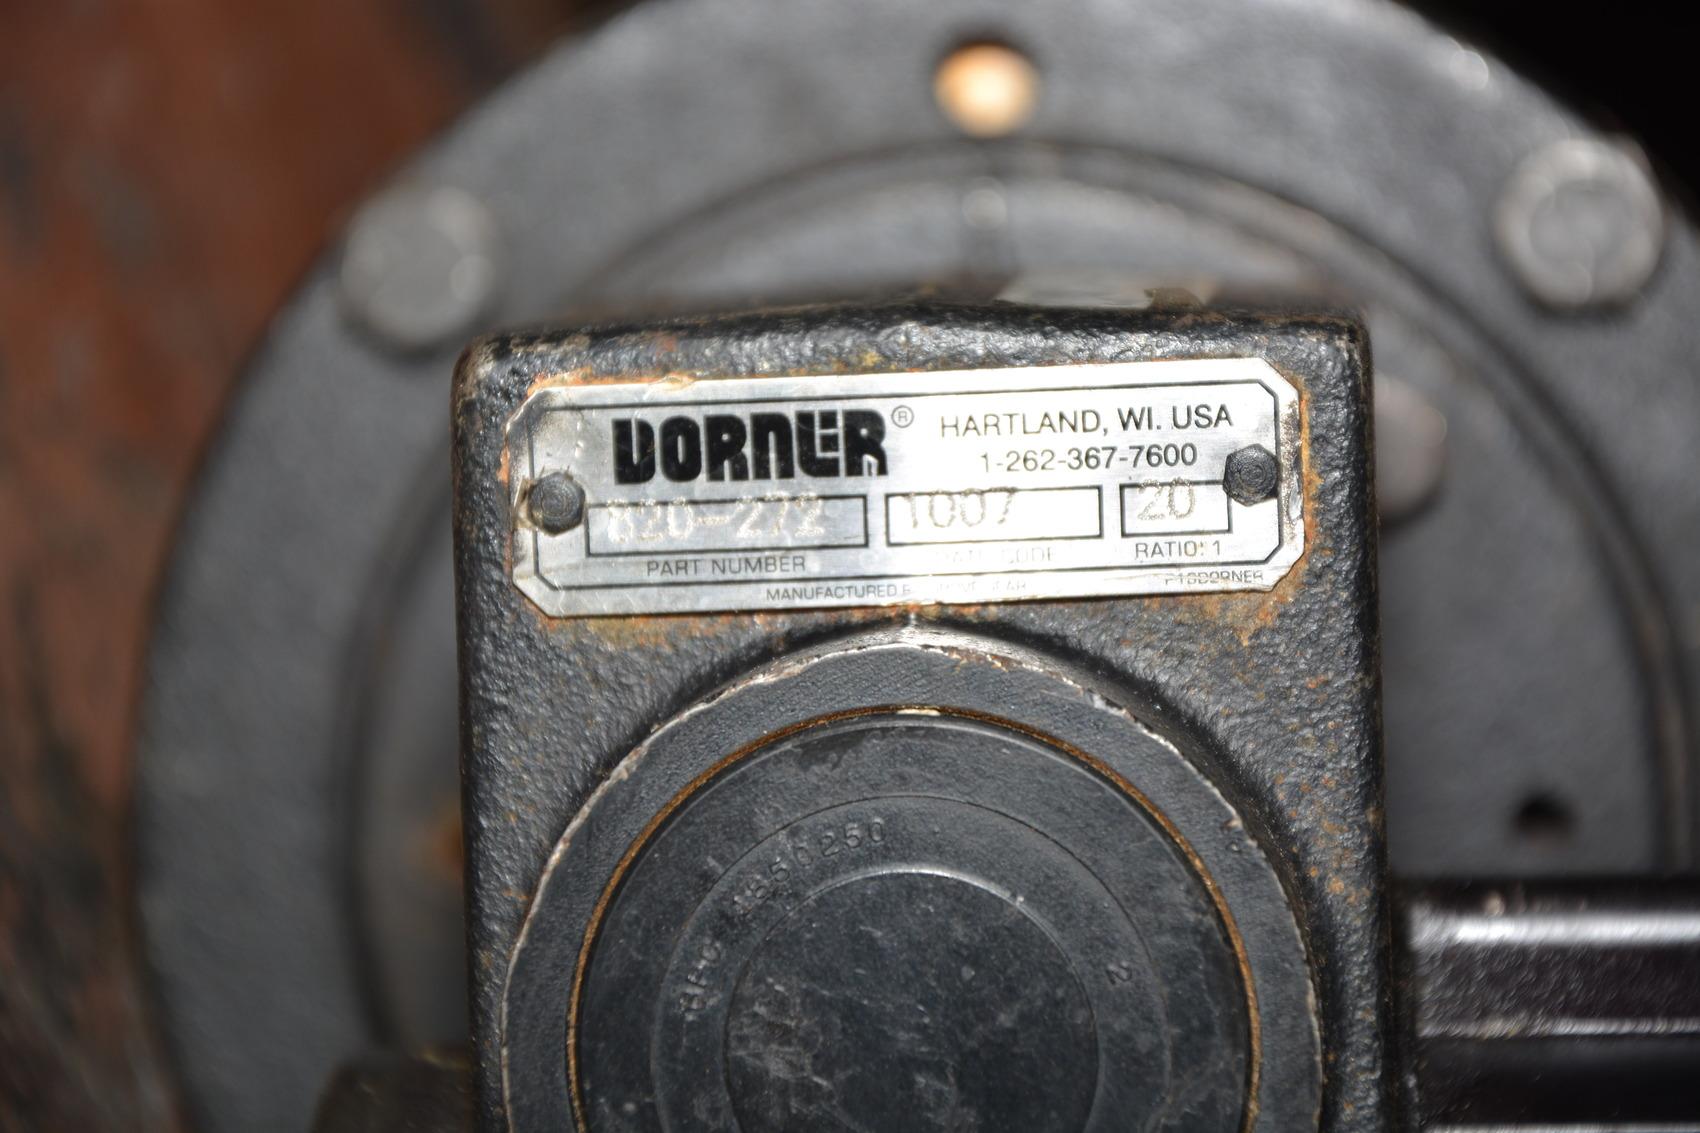 Dayton 1 2 hp type 2m168d dc gear motor dorner 20 1 ratio Dorner motor